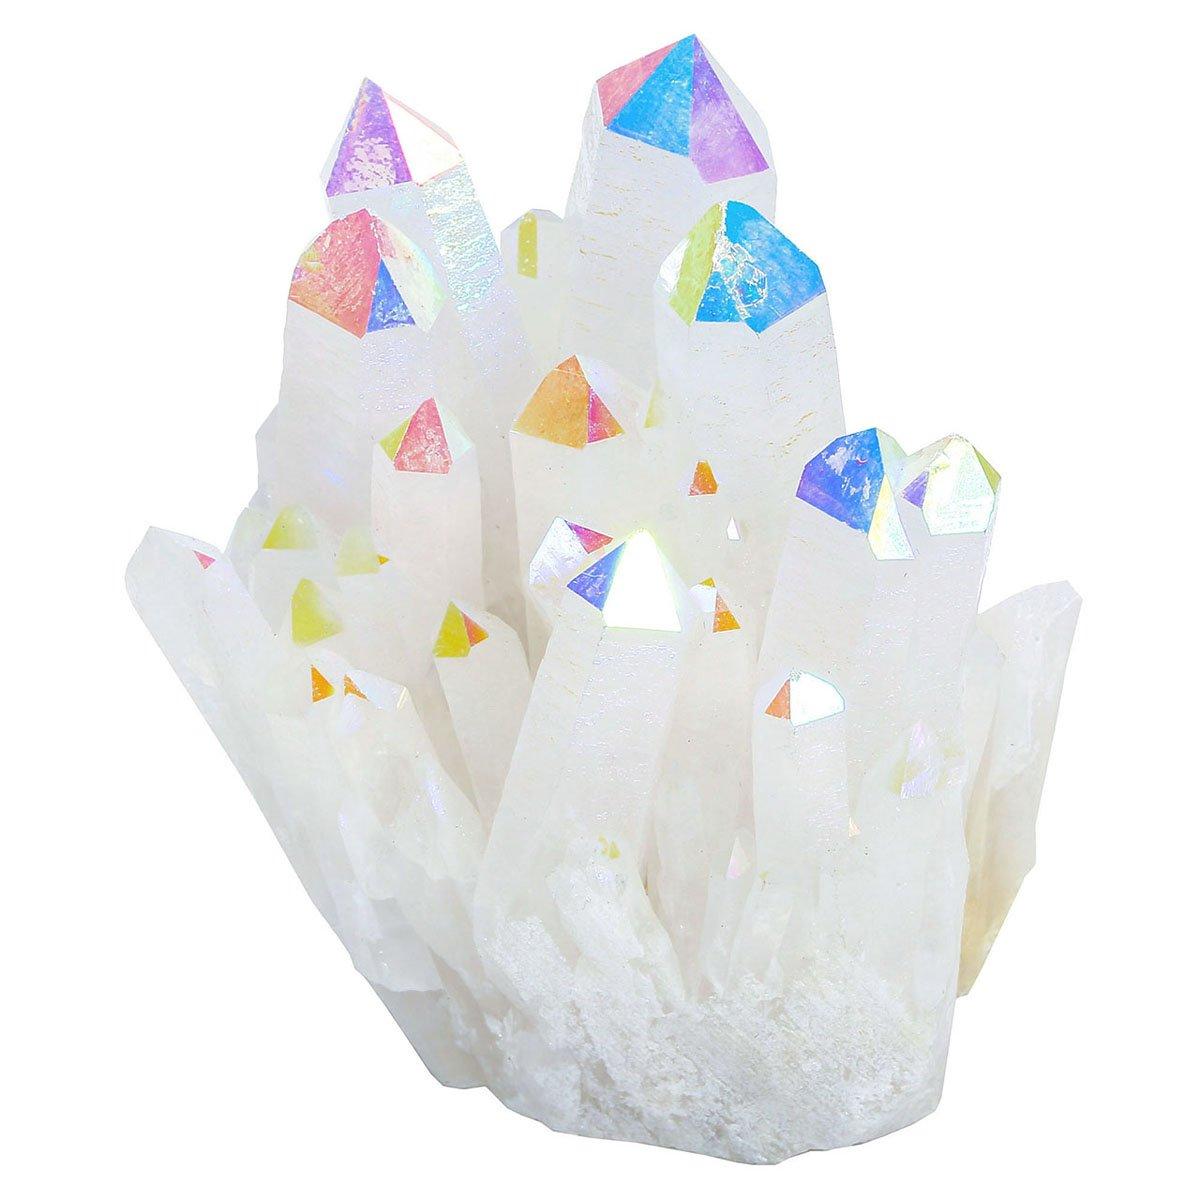 CrystalTears Rock Quartz Titanium Coated Blue Crystal Cluster Geode Druzy Specimen 1.85-2.5 Home Decor Ornaments